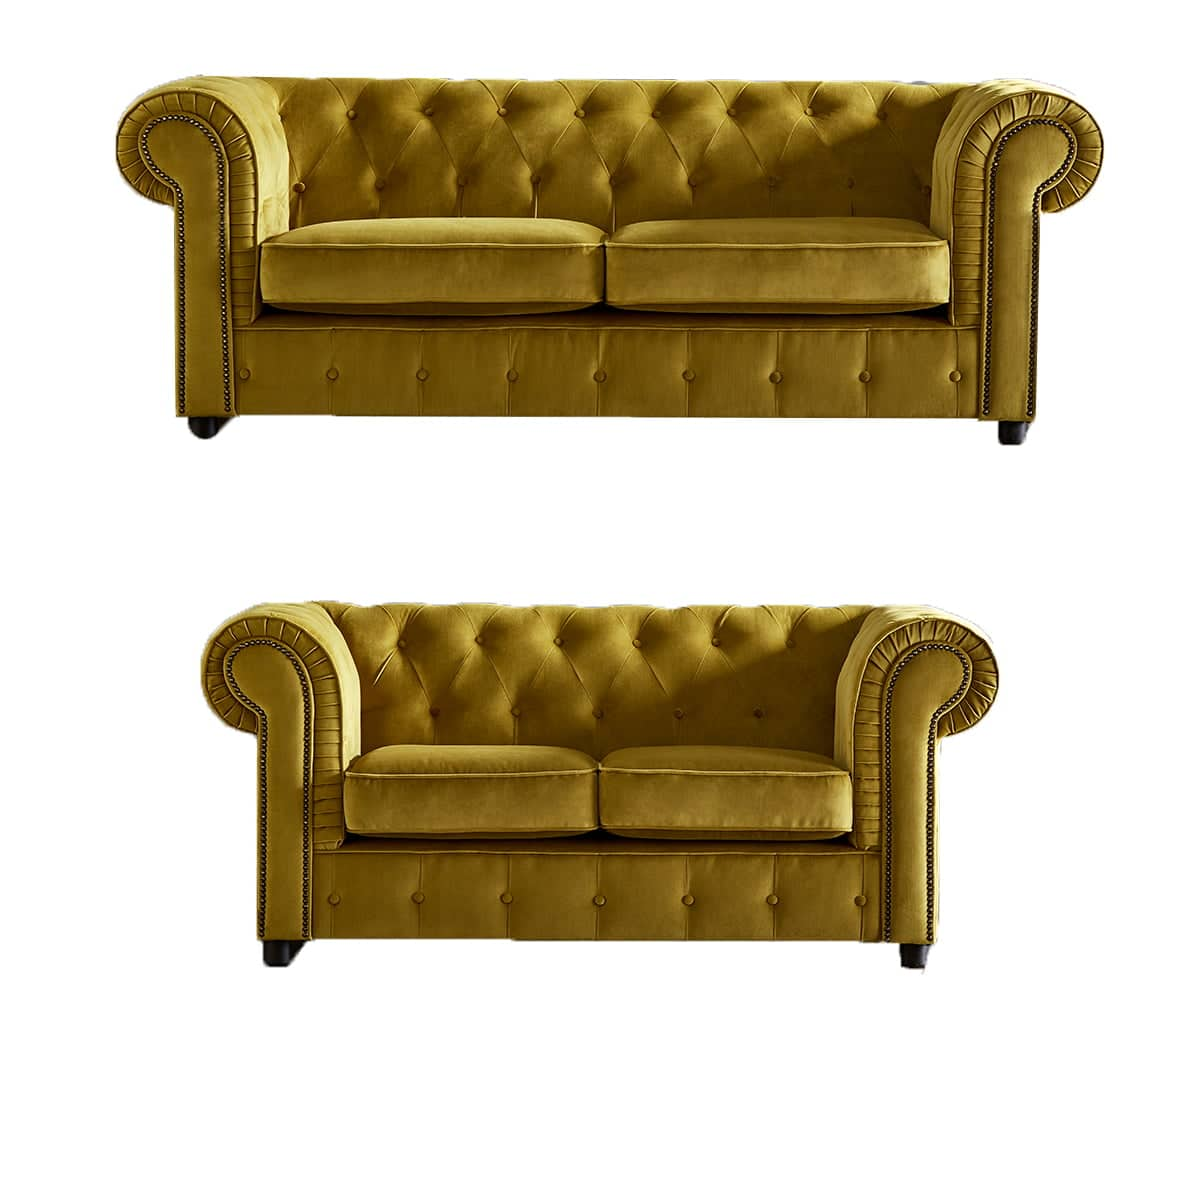 chelmsford yellow 3 and 2 sofa suite plush velvet chesterfield sofajpg